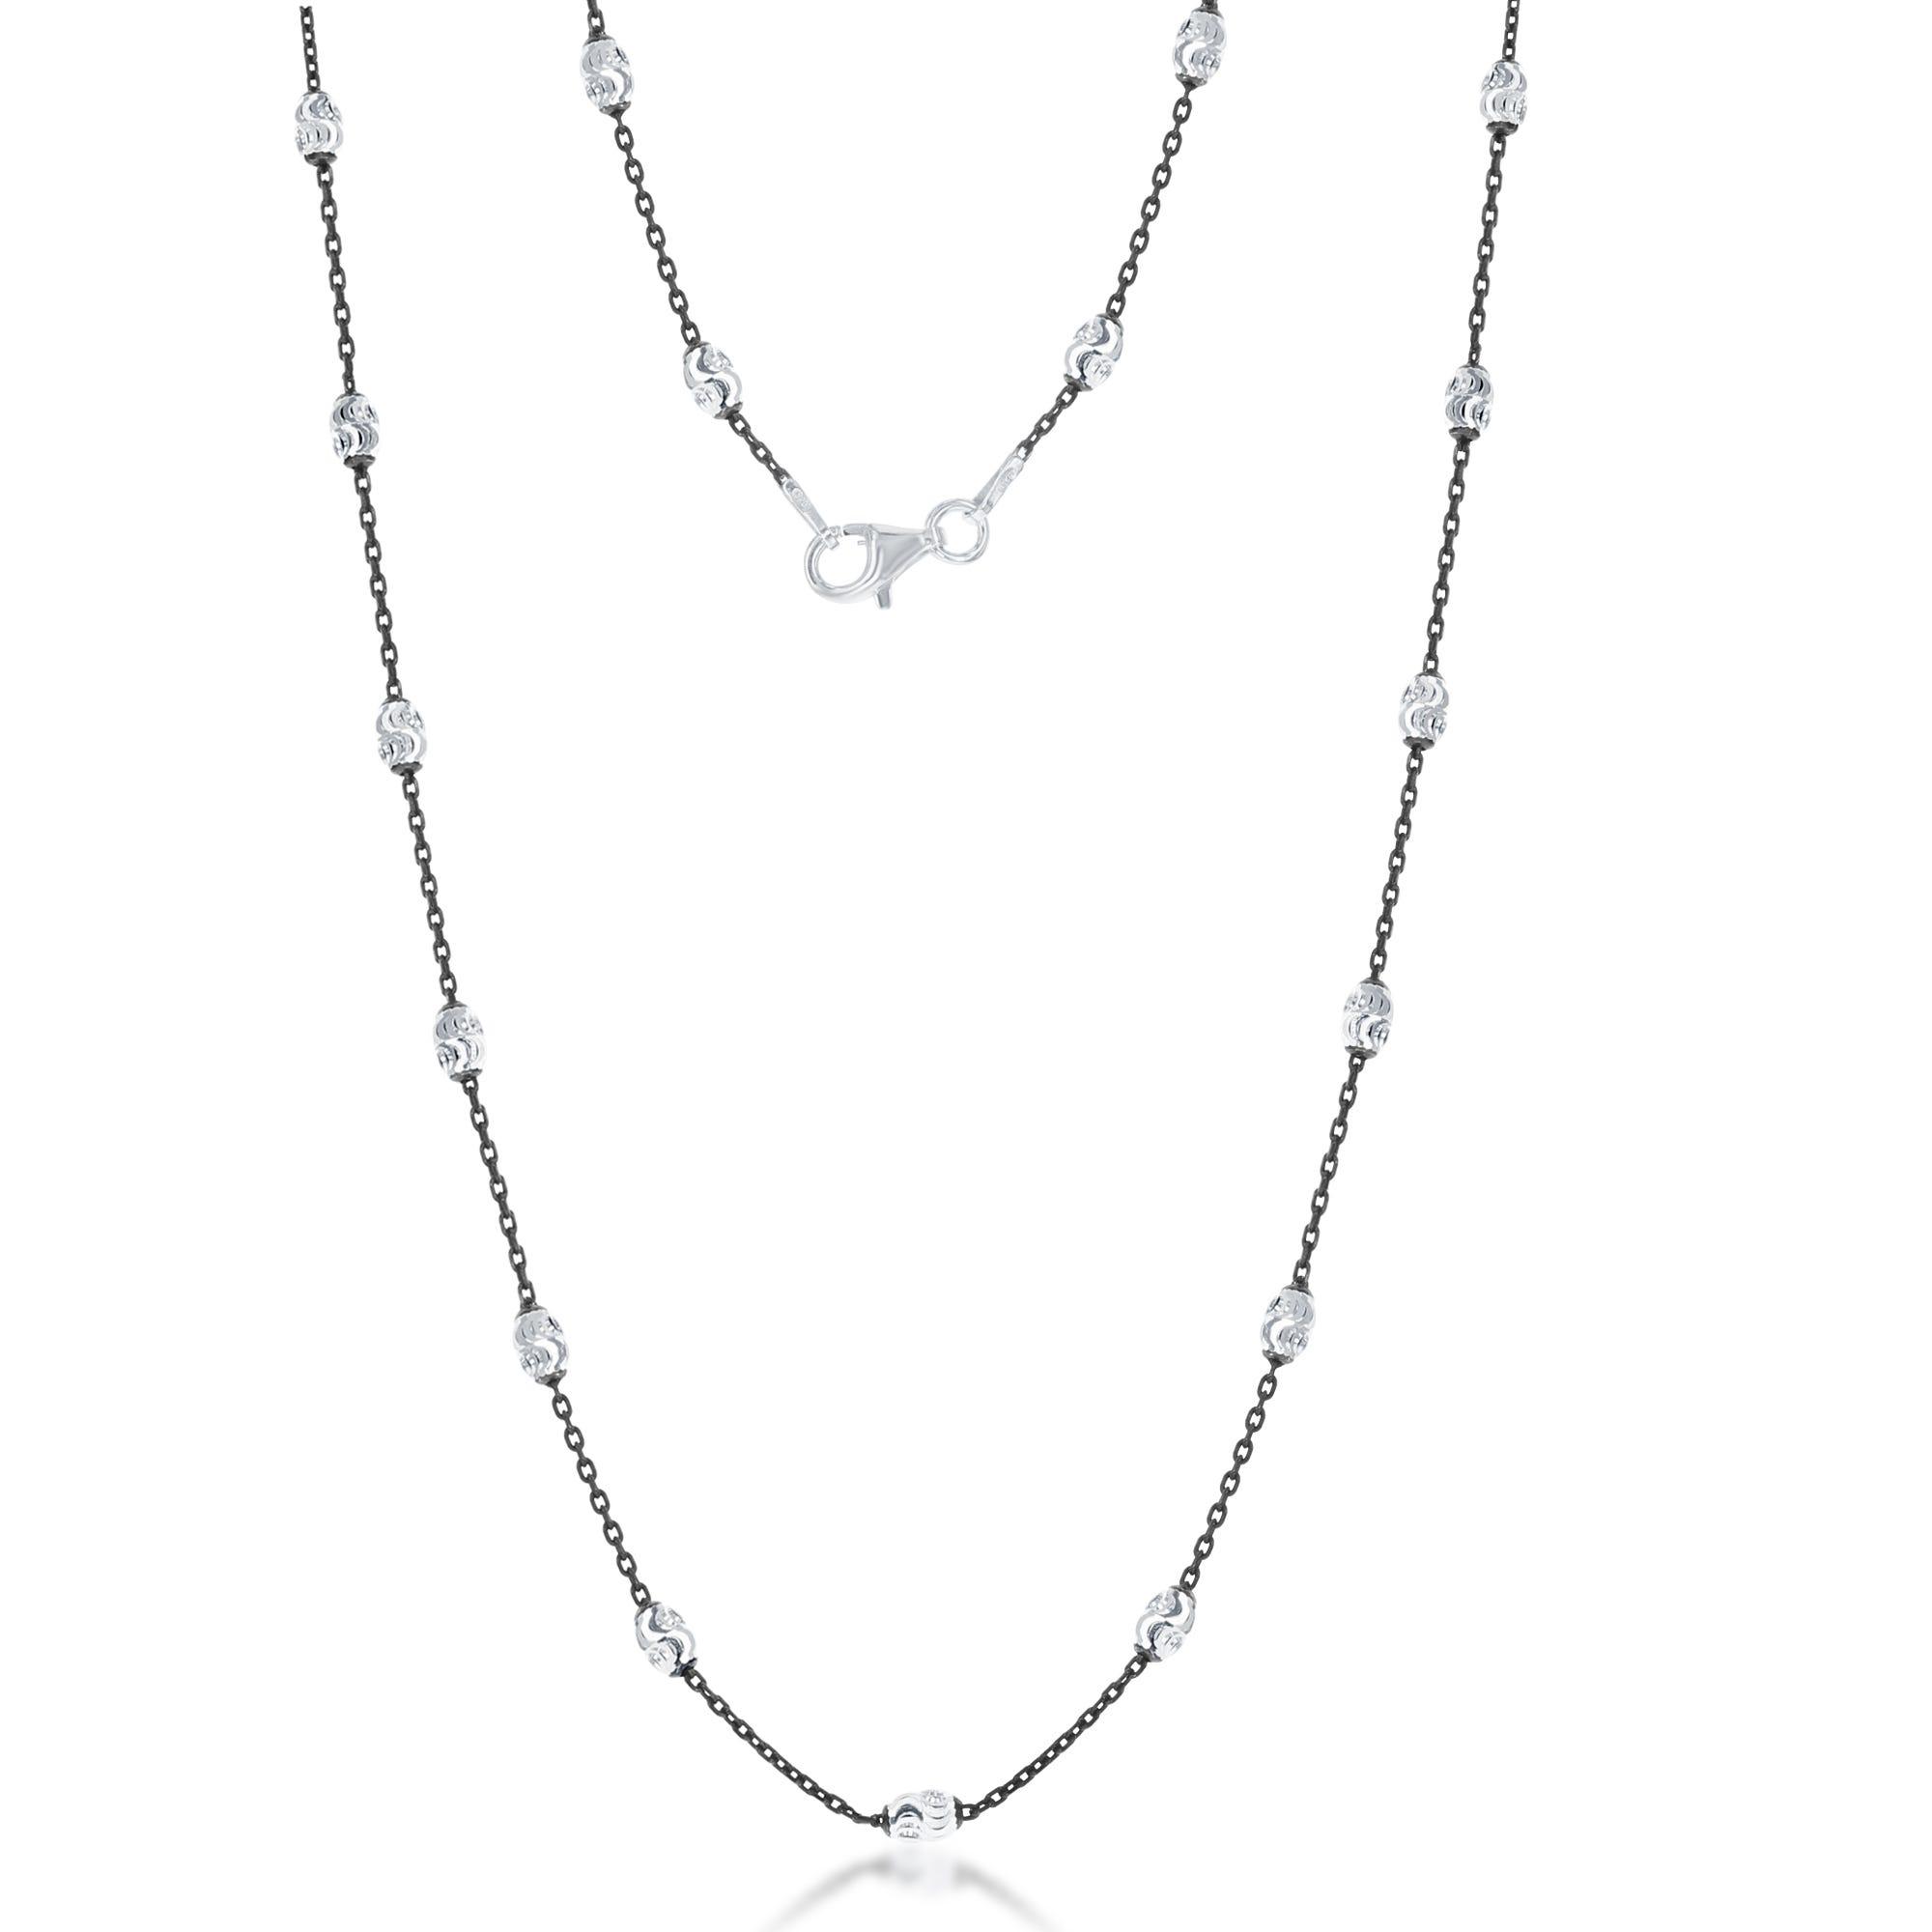 Black Rhodium Diamond Cut Oval Moon Bead Chain 20